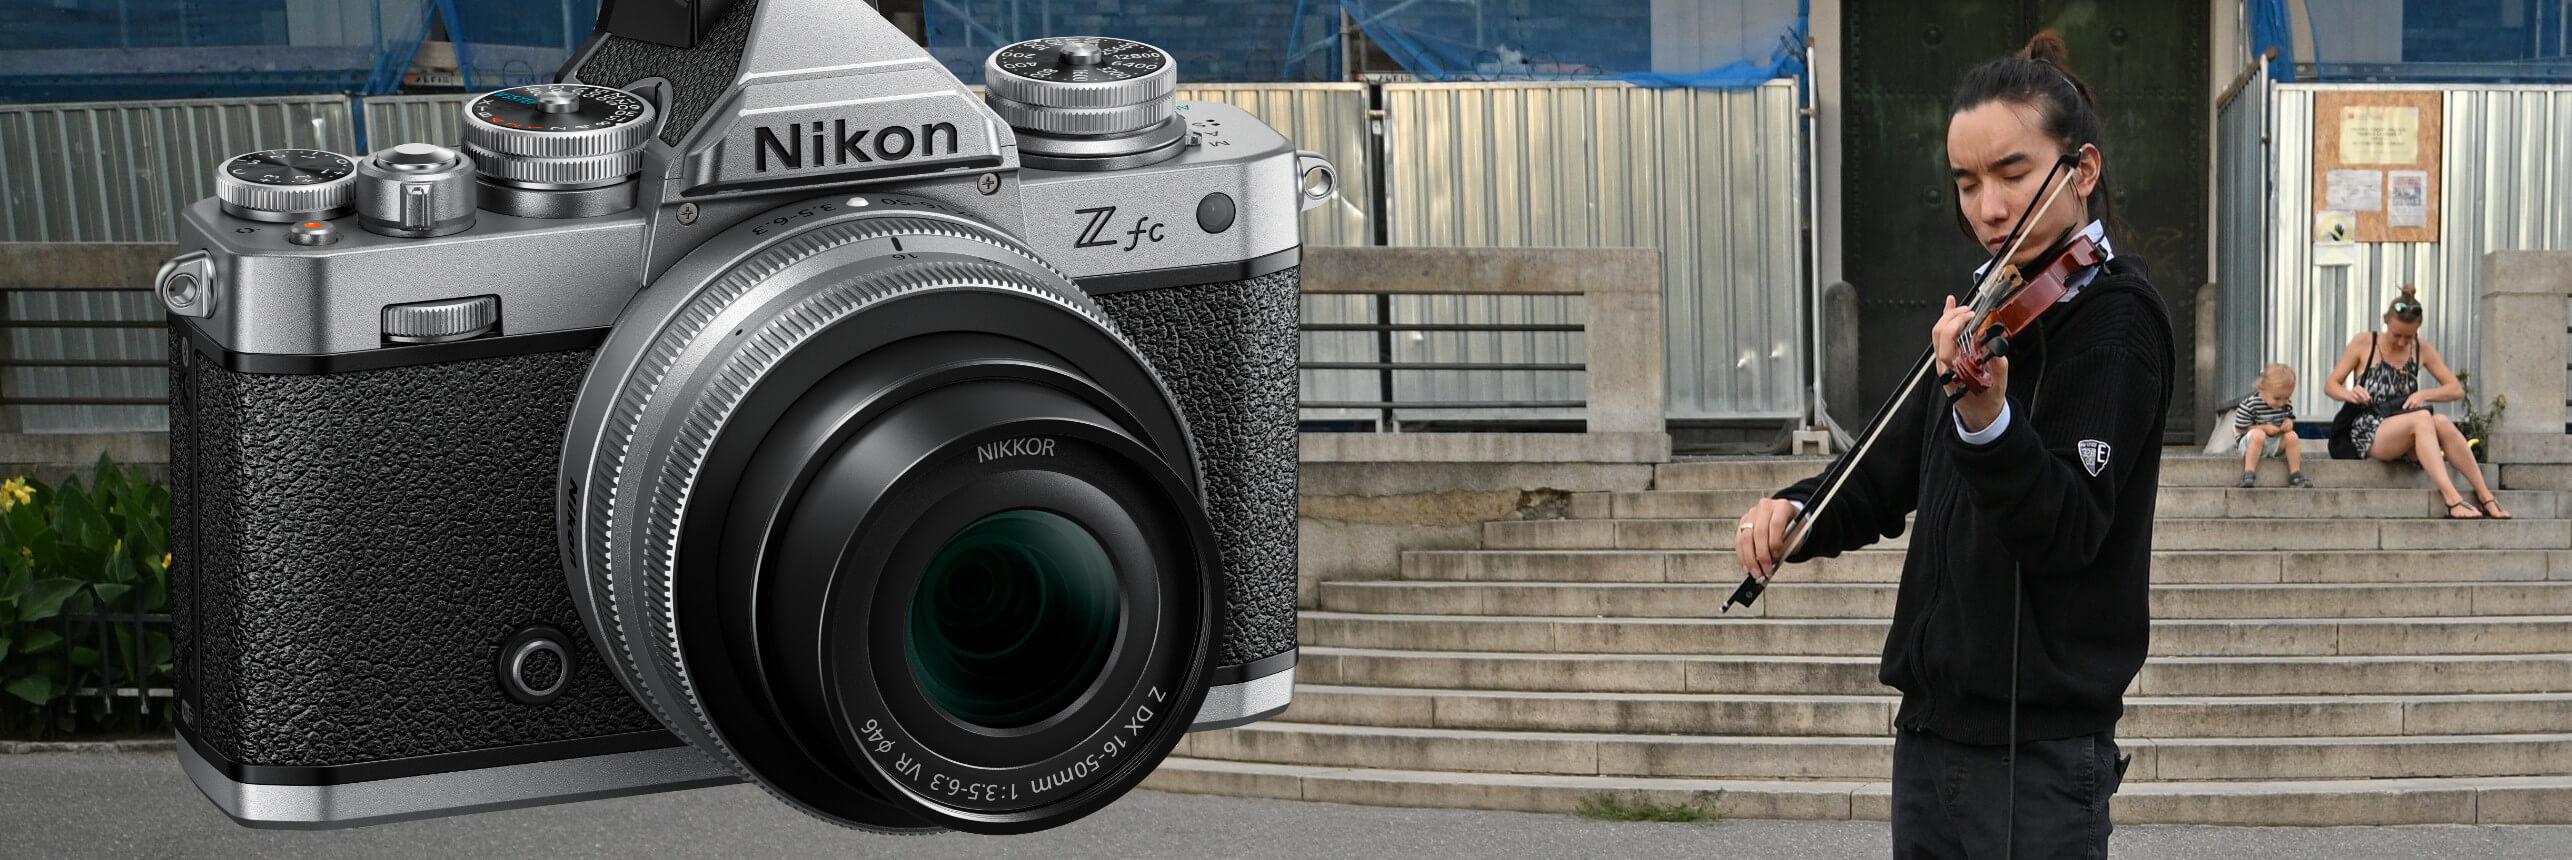 Nikon Z fc – v podrobné recenzi Nikonblogu